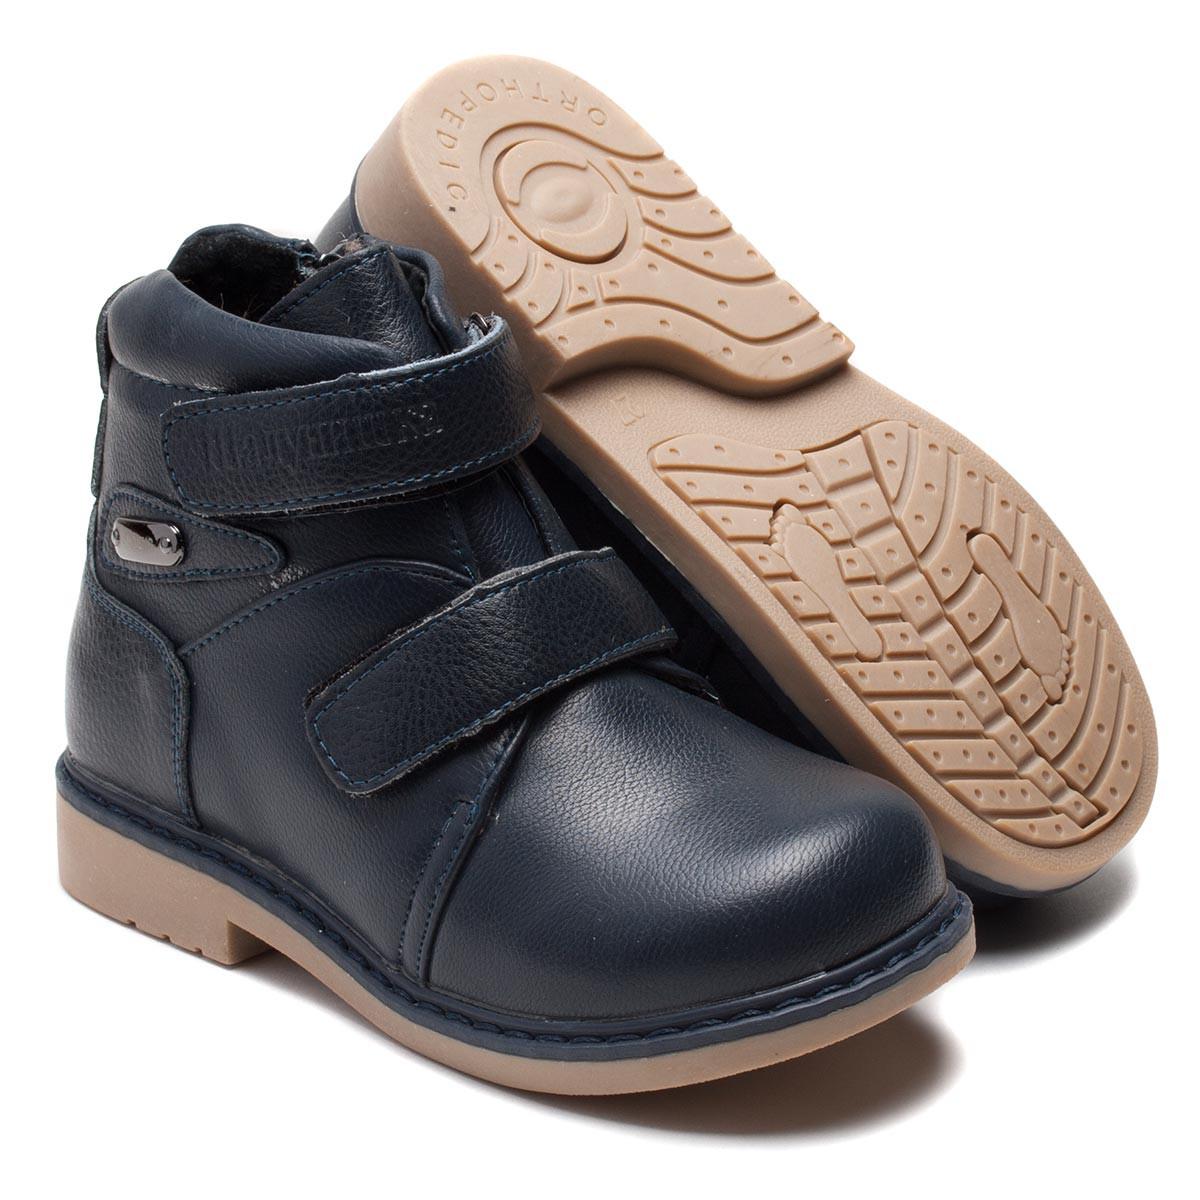 27196d84c12faf Зимние ботинки Шалунишка-ортопед, для мальчика, размер 26-31, фото 2